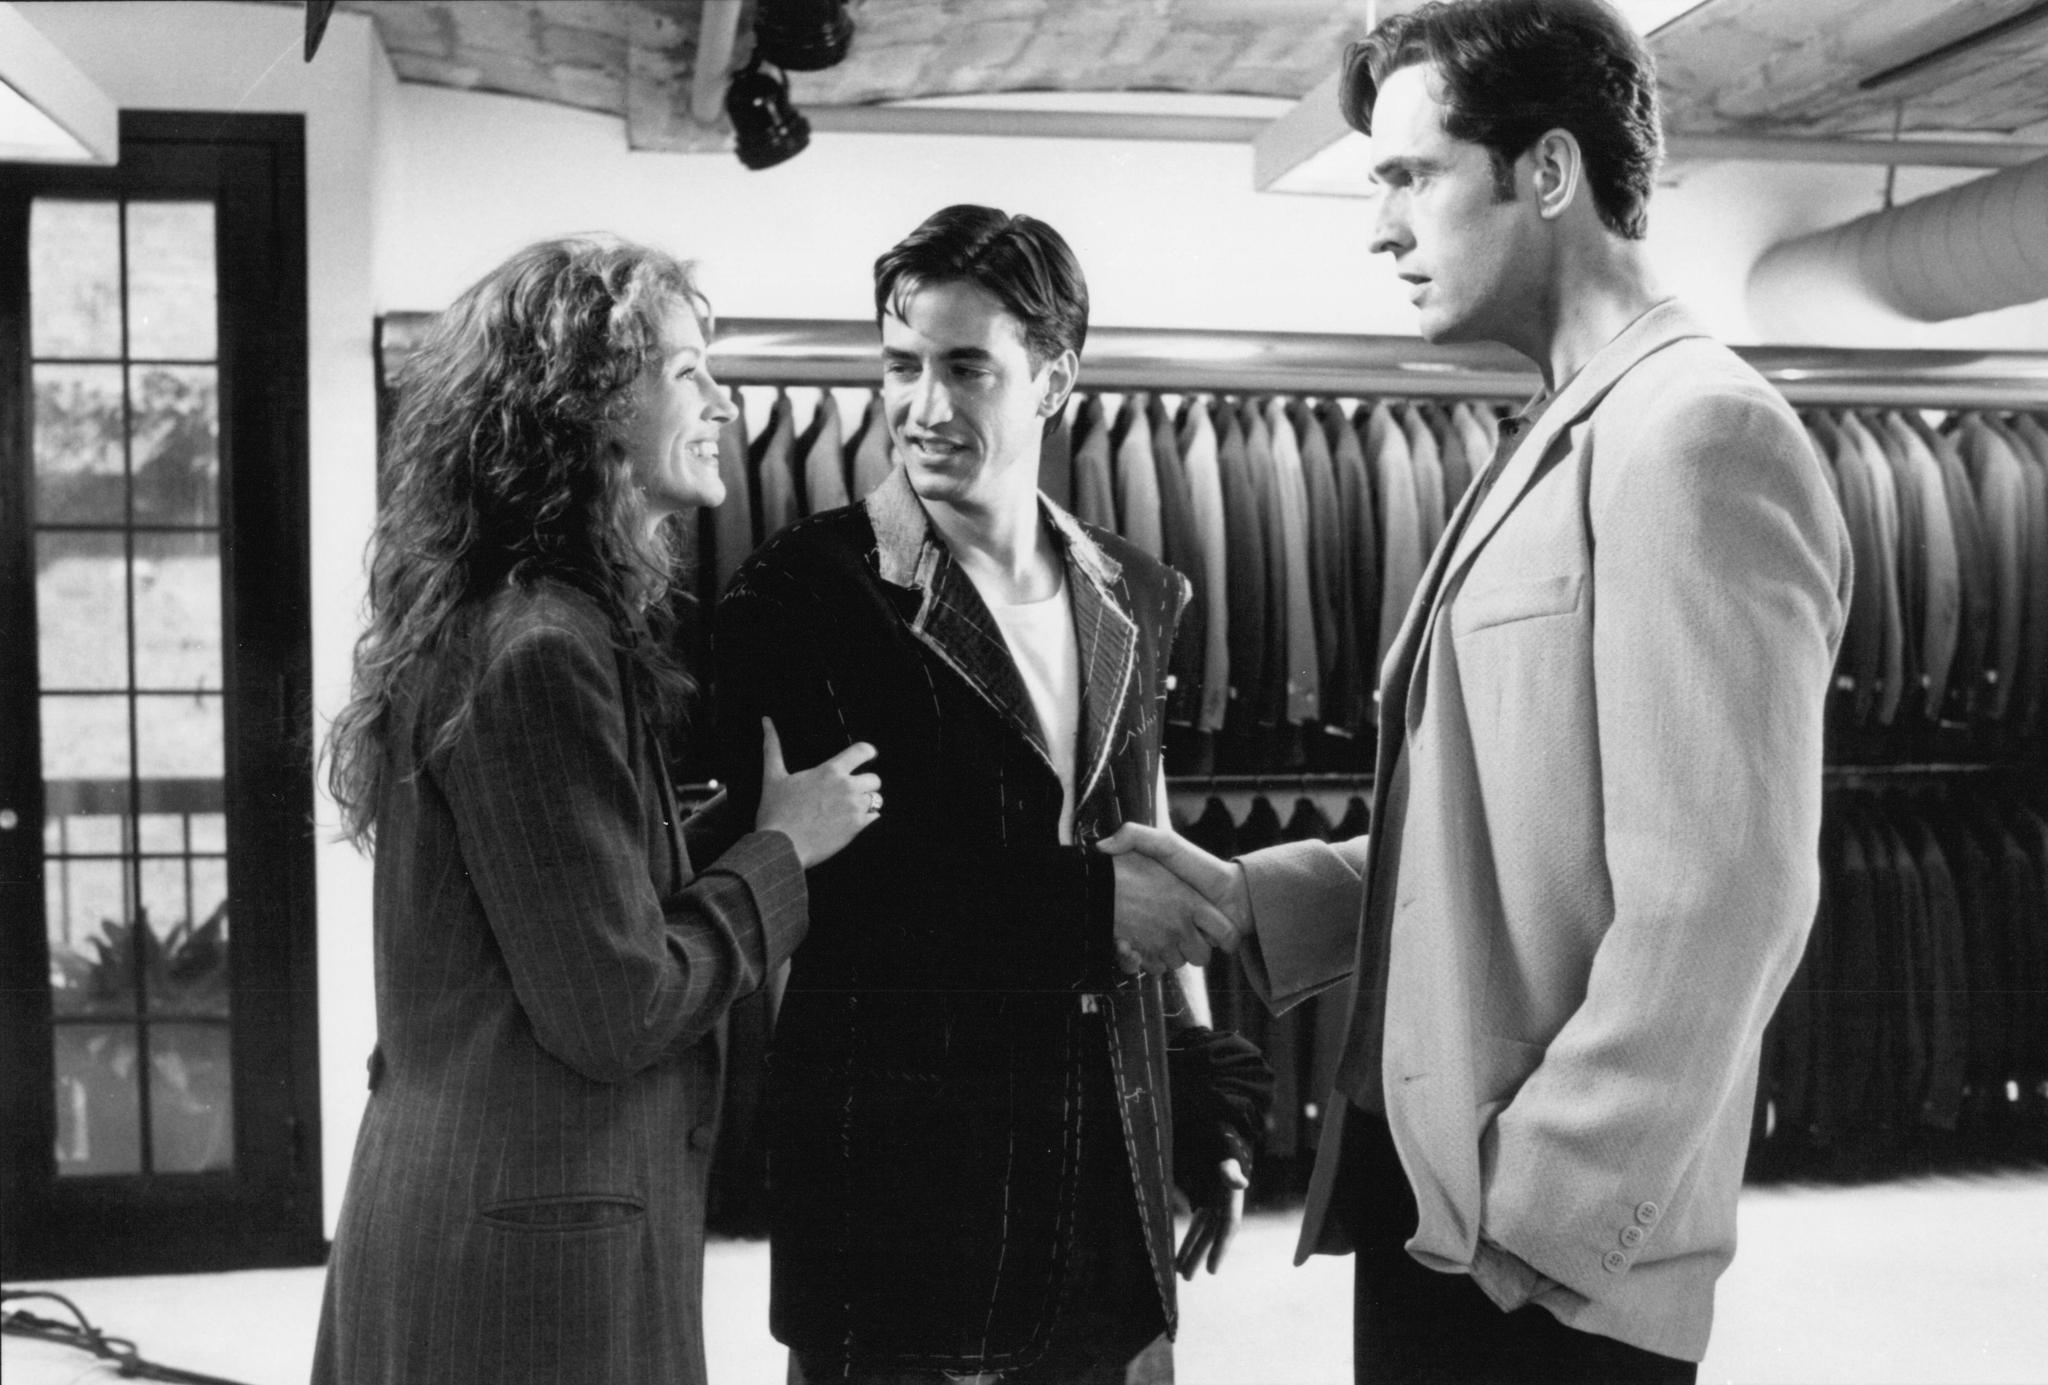 Julia Roberts, Rupert Everett, and Dermot Mulroney in My Best Friend's Wedding (1997)